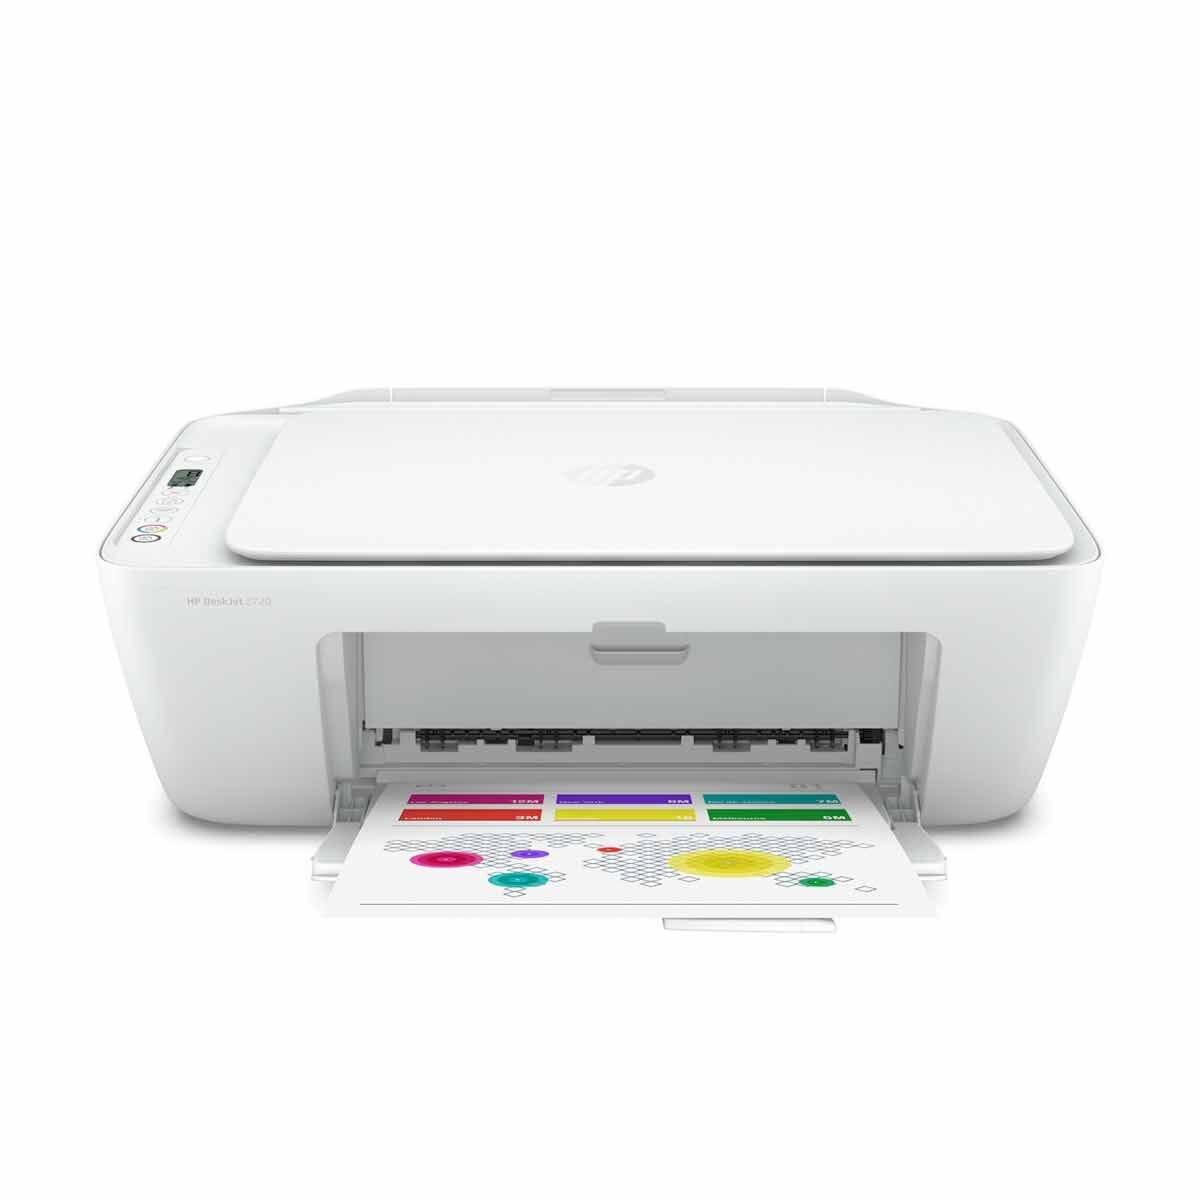 HP Deskjet 2720 All in One Wireless Printer